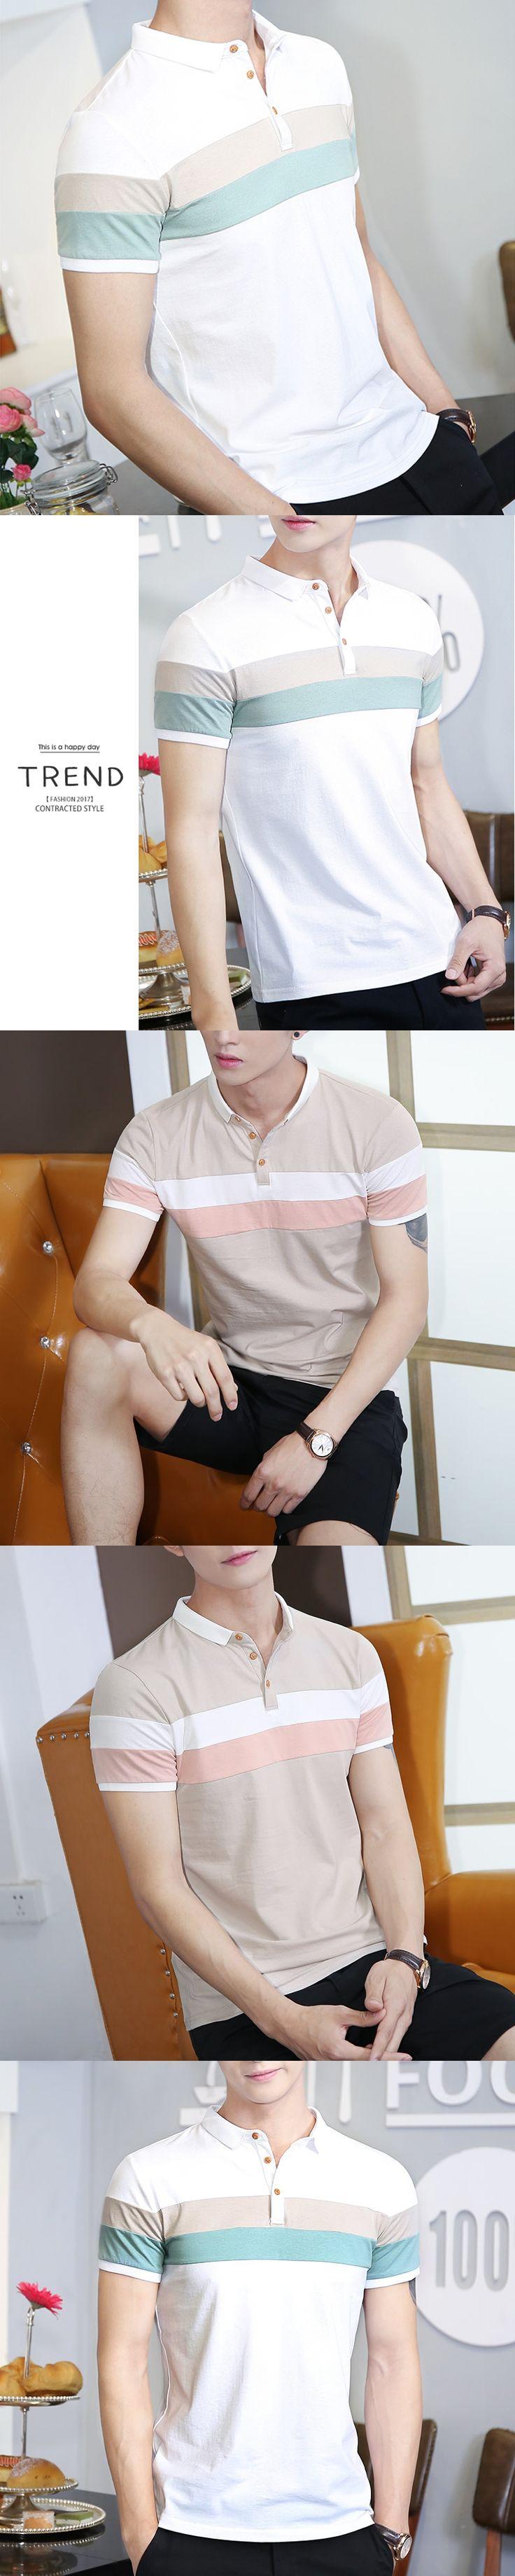 Kayphil Short Sleeve Striped Pattern Lapel Casual Cotton POLO Shirt for Men Korean Fashion Tops M-4XL